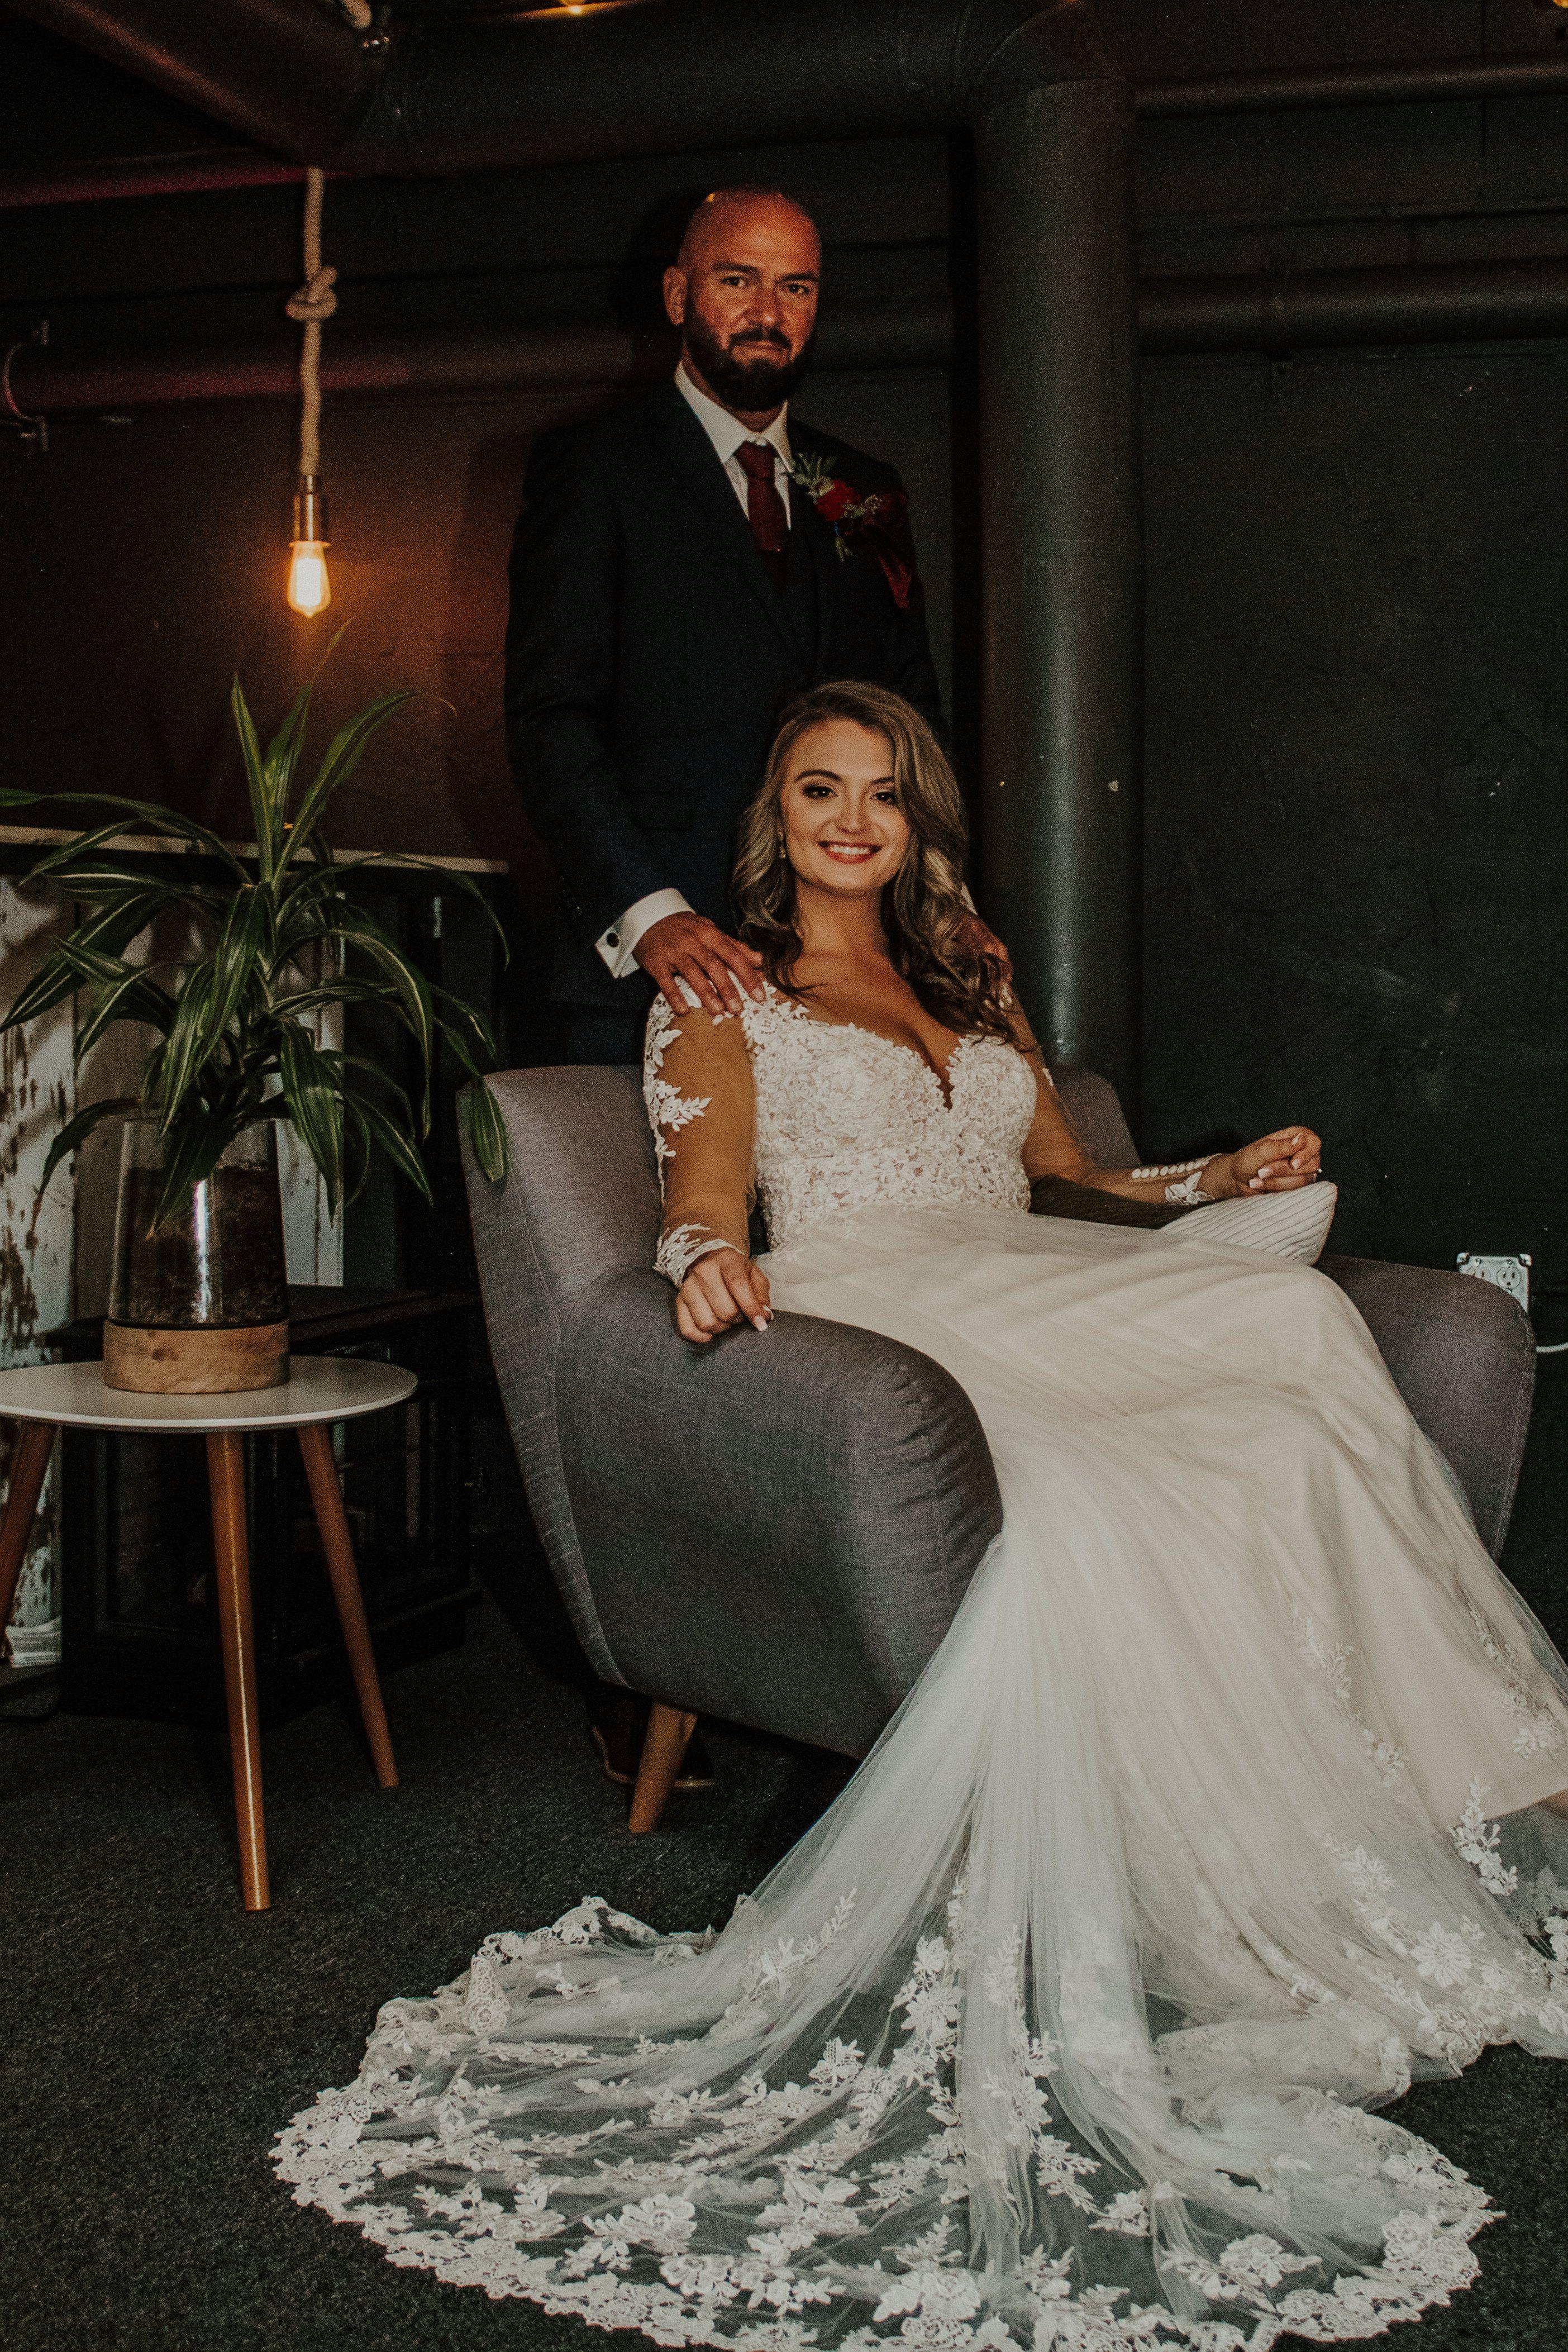 Unique Wedding Wedding Inspiration Wedding Goals Wedding